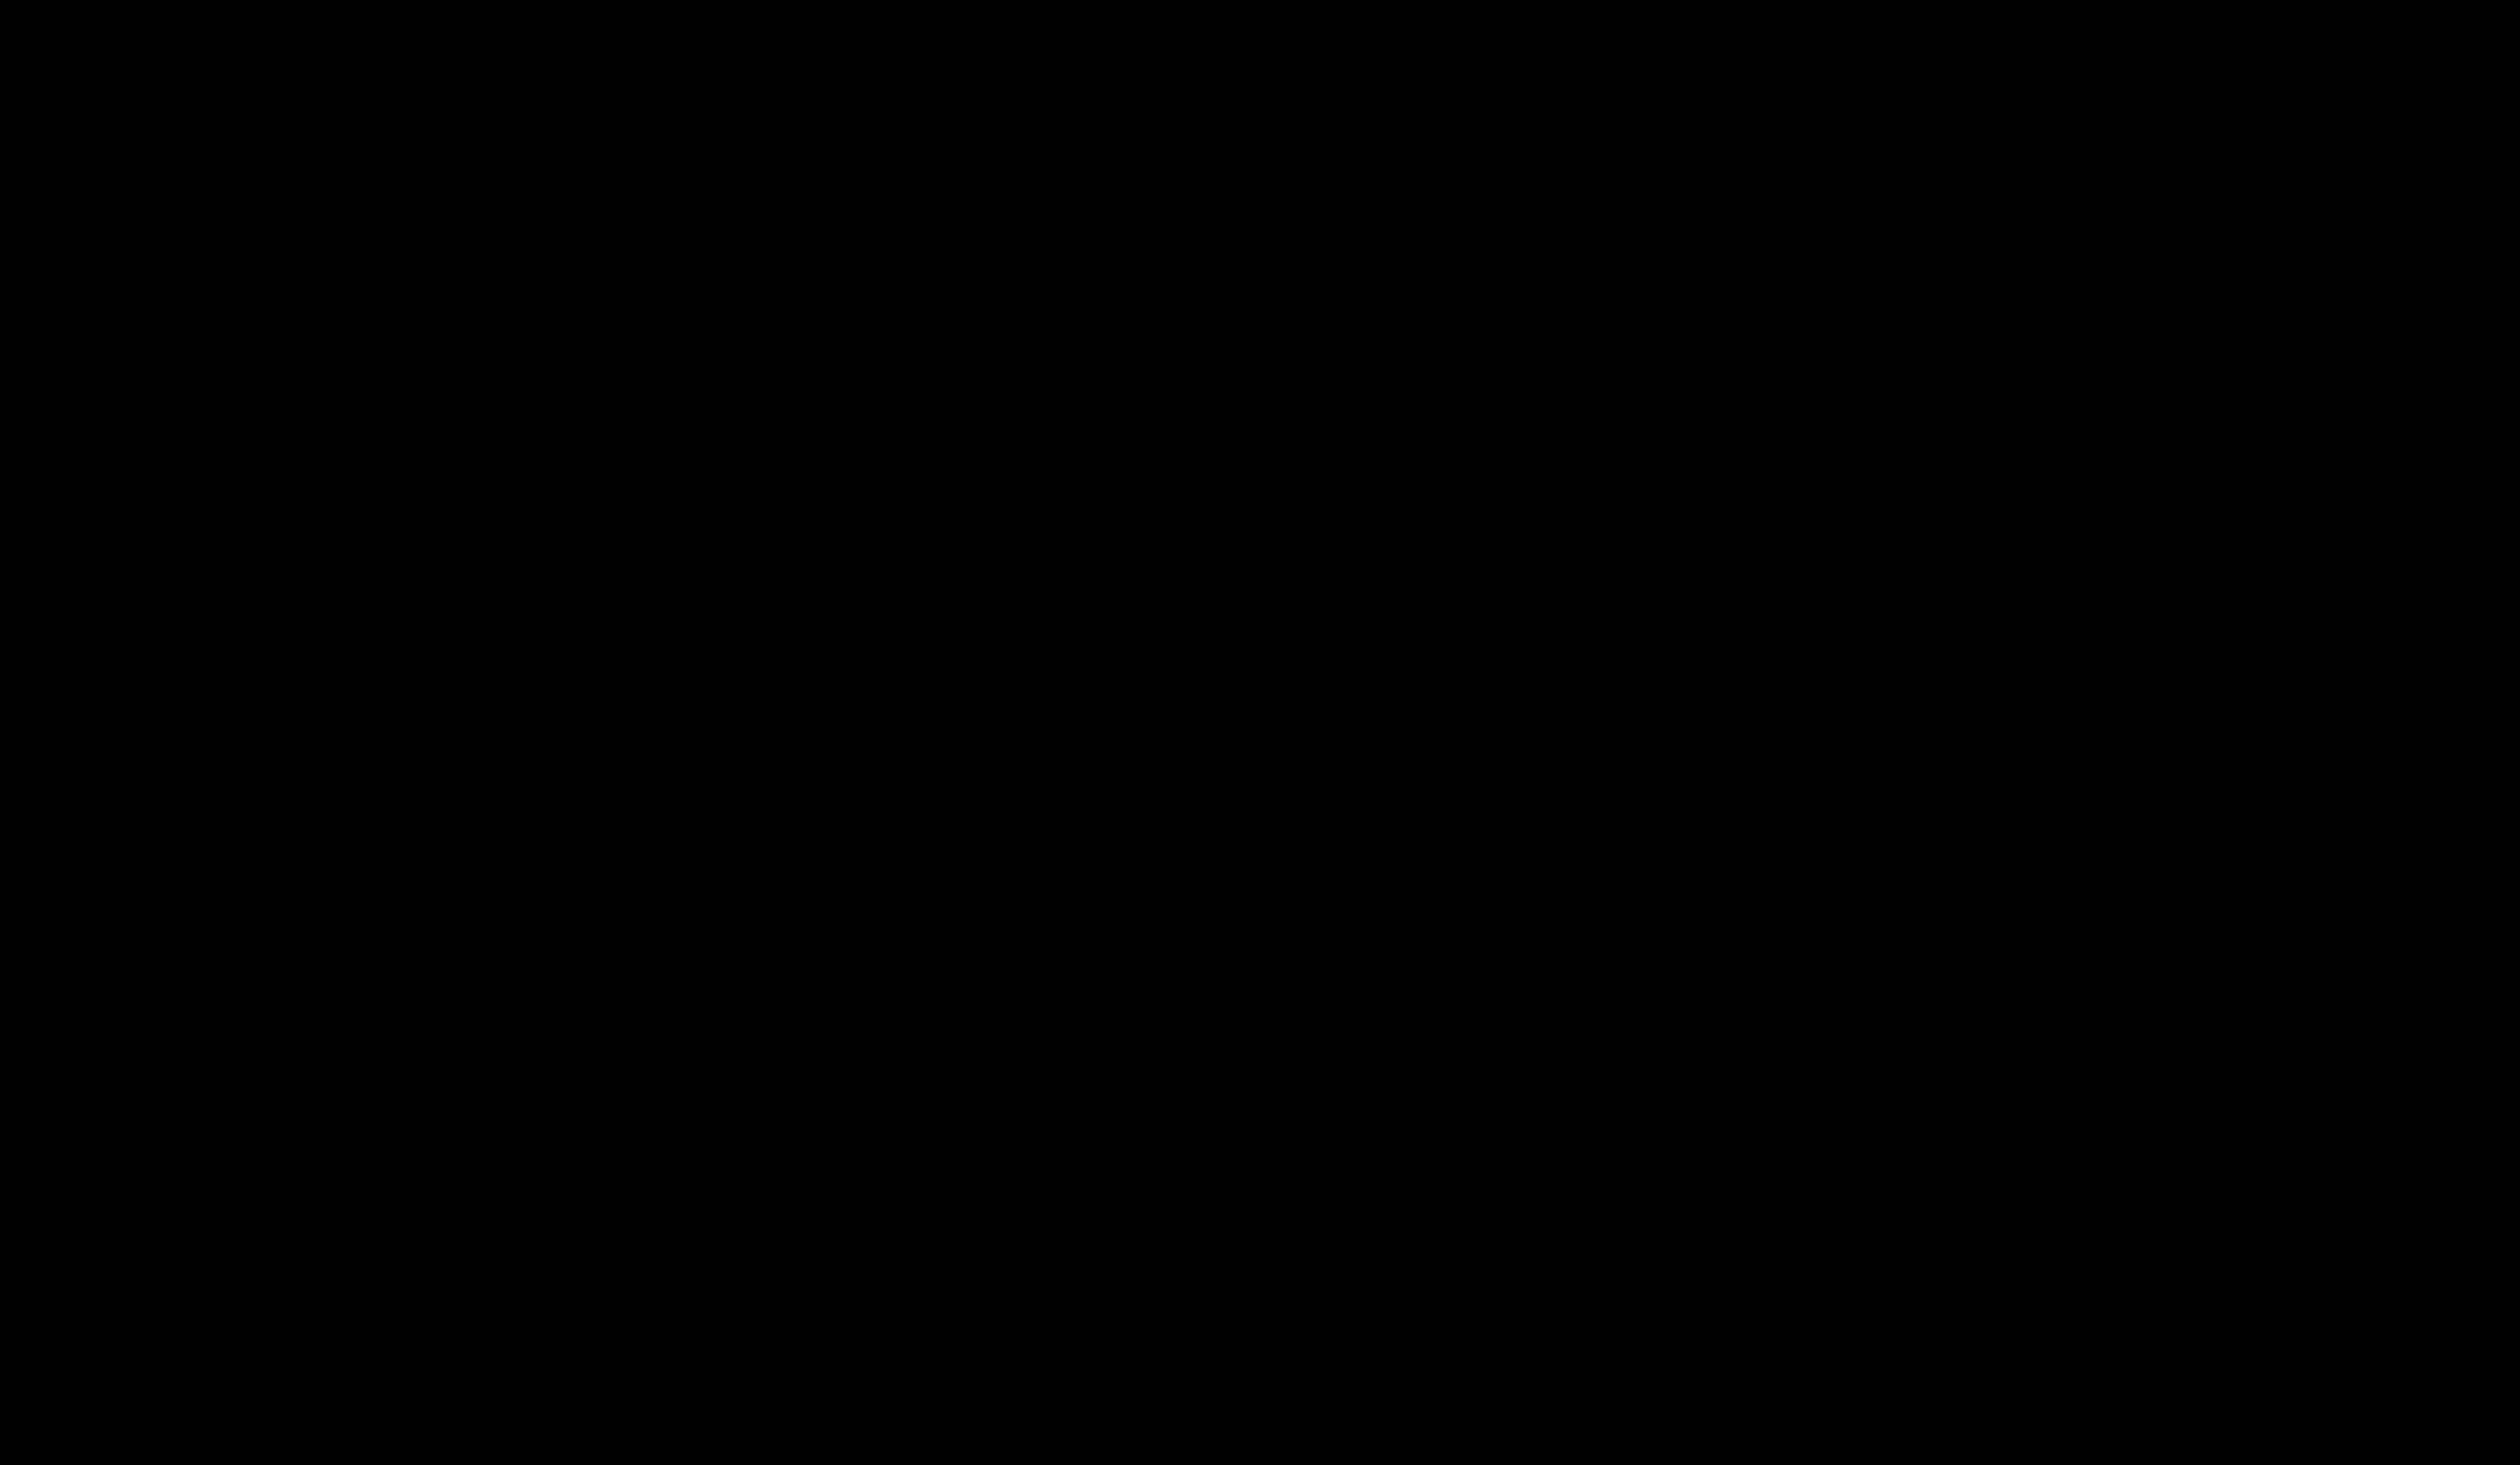 Ordner in Metallregalen